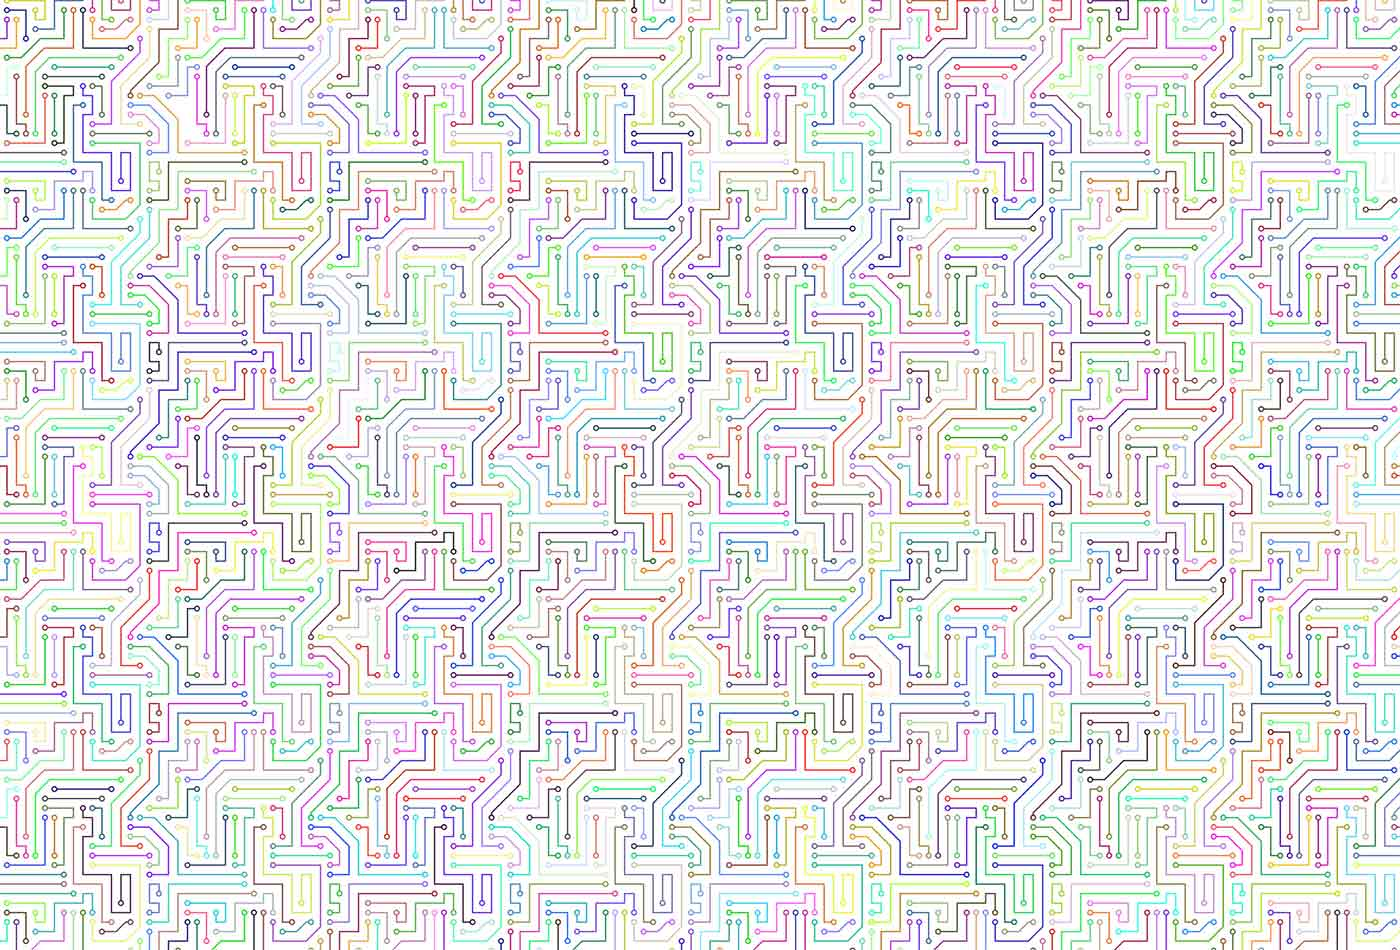 Network pattern